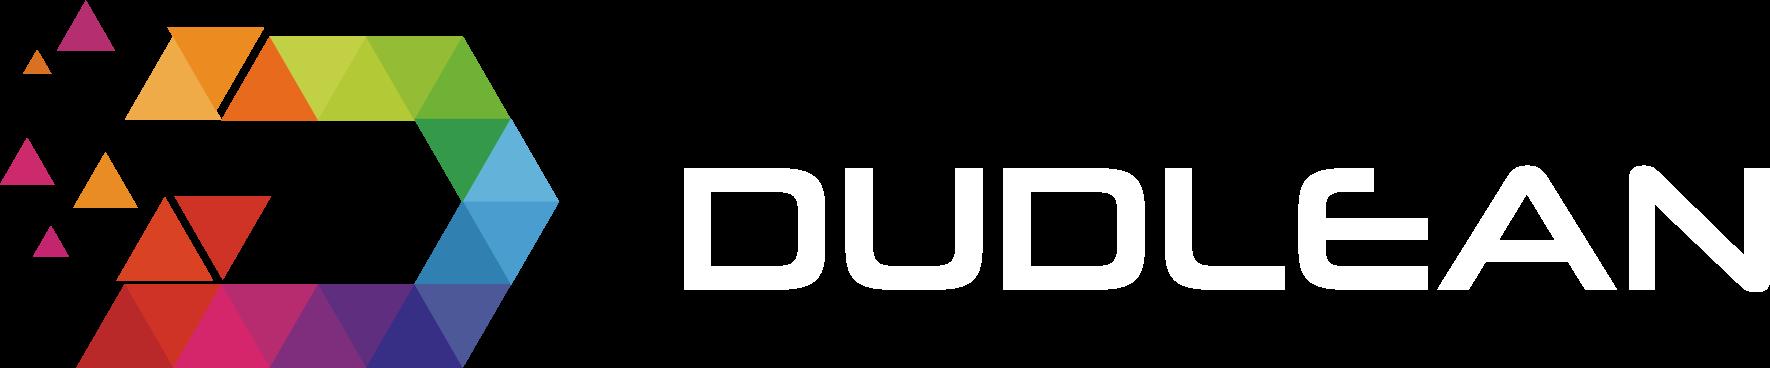 Dudlean